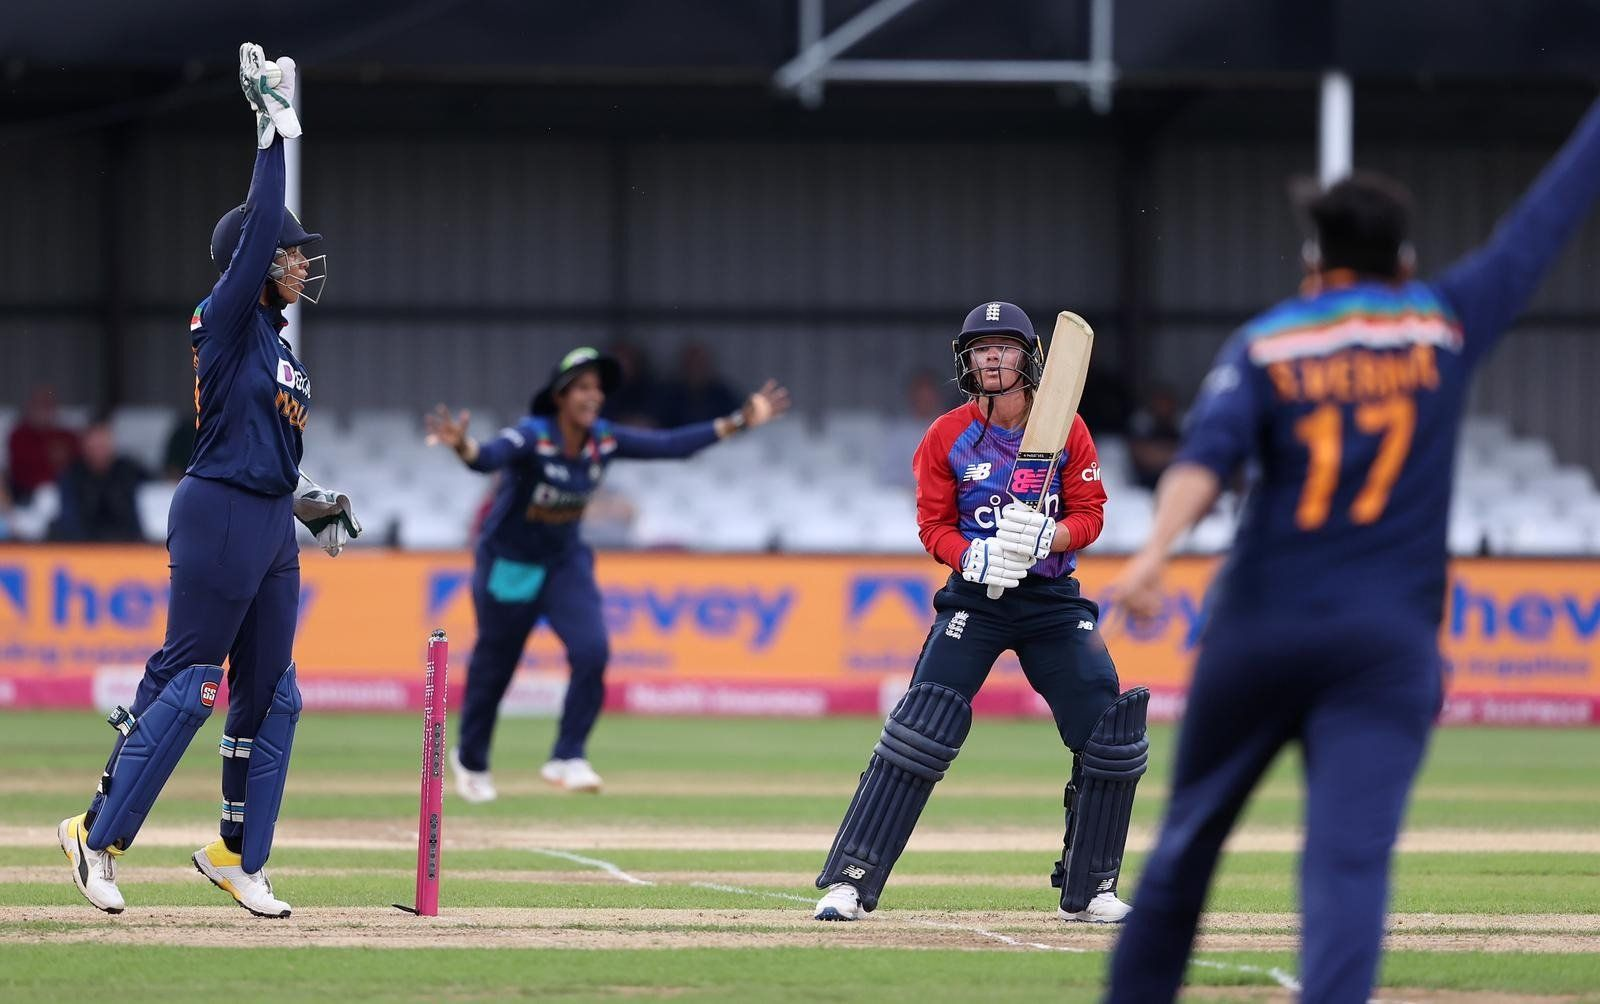 India women vs England Women first T20I